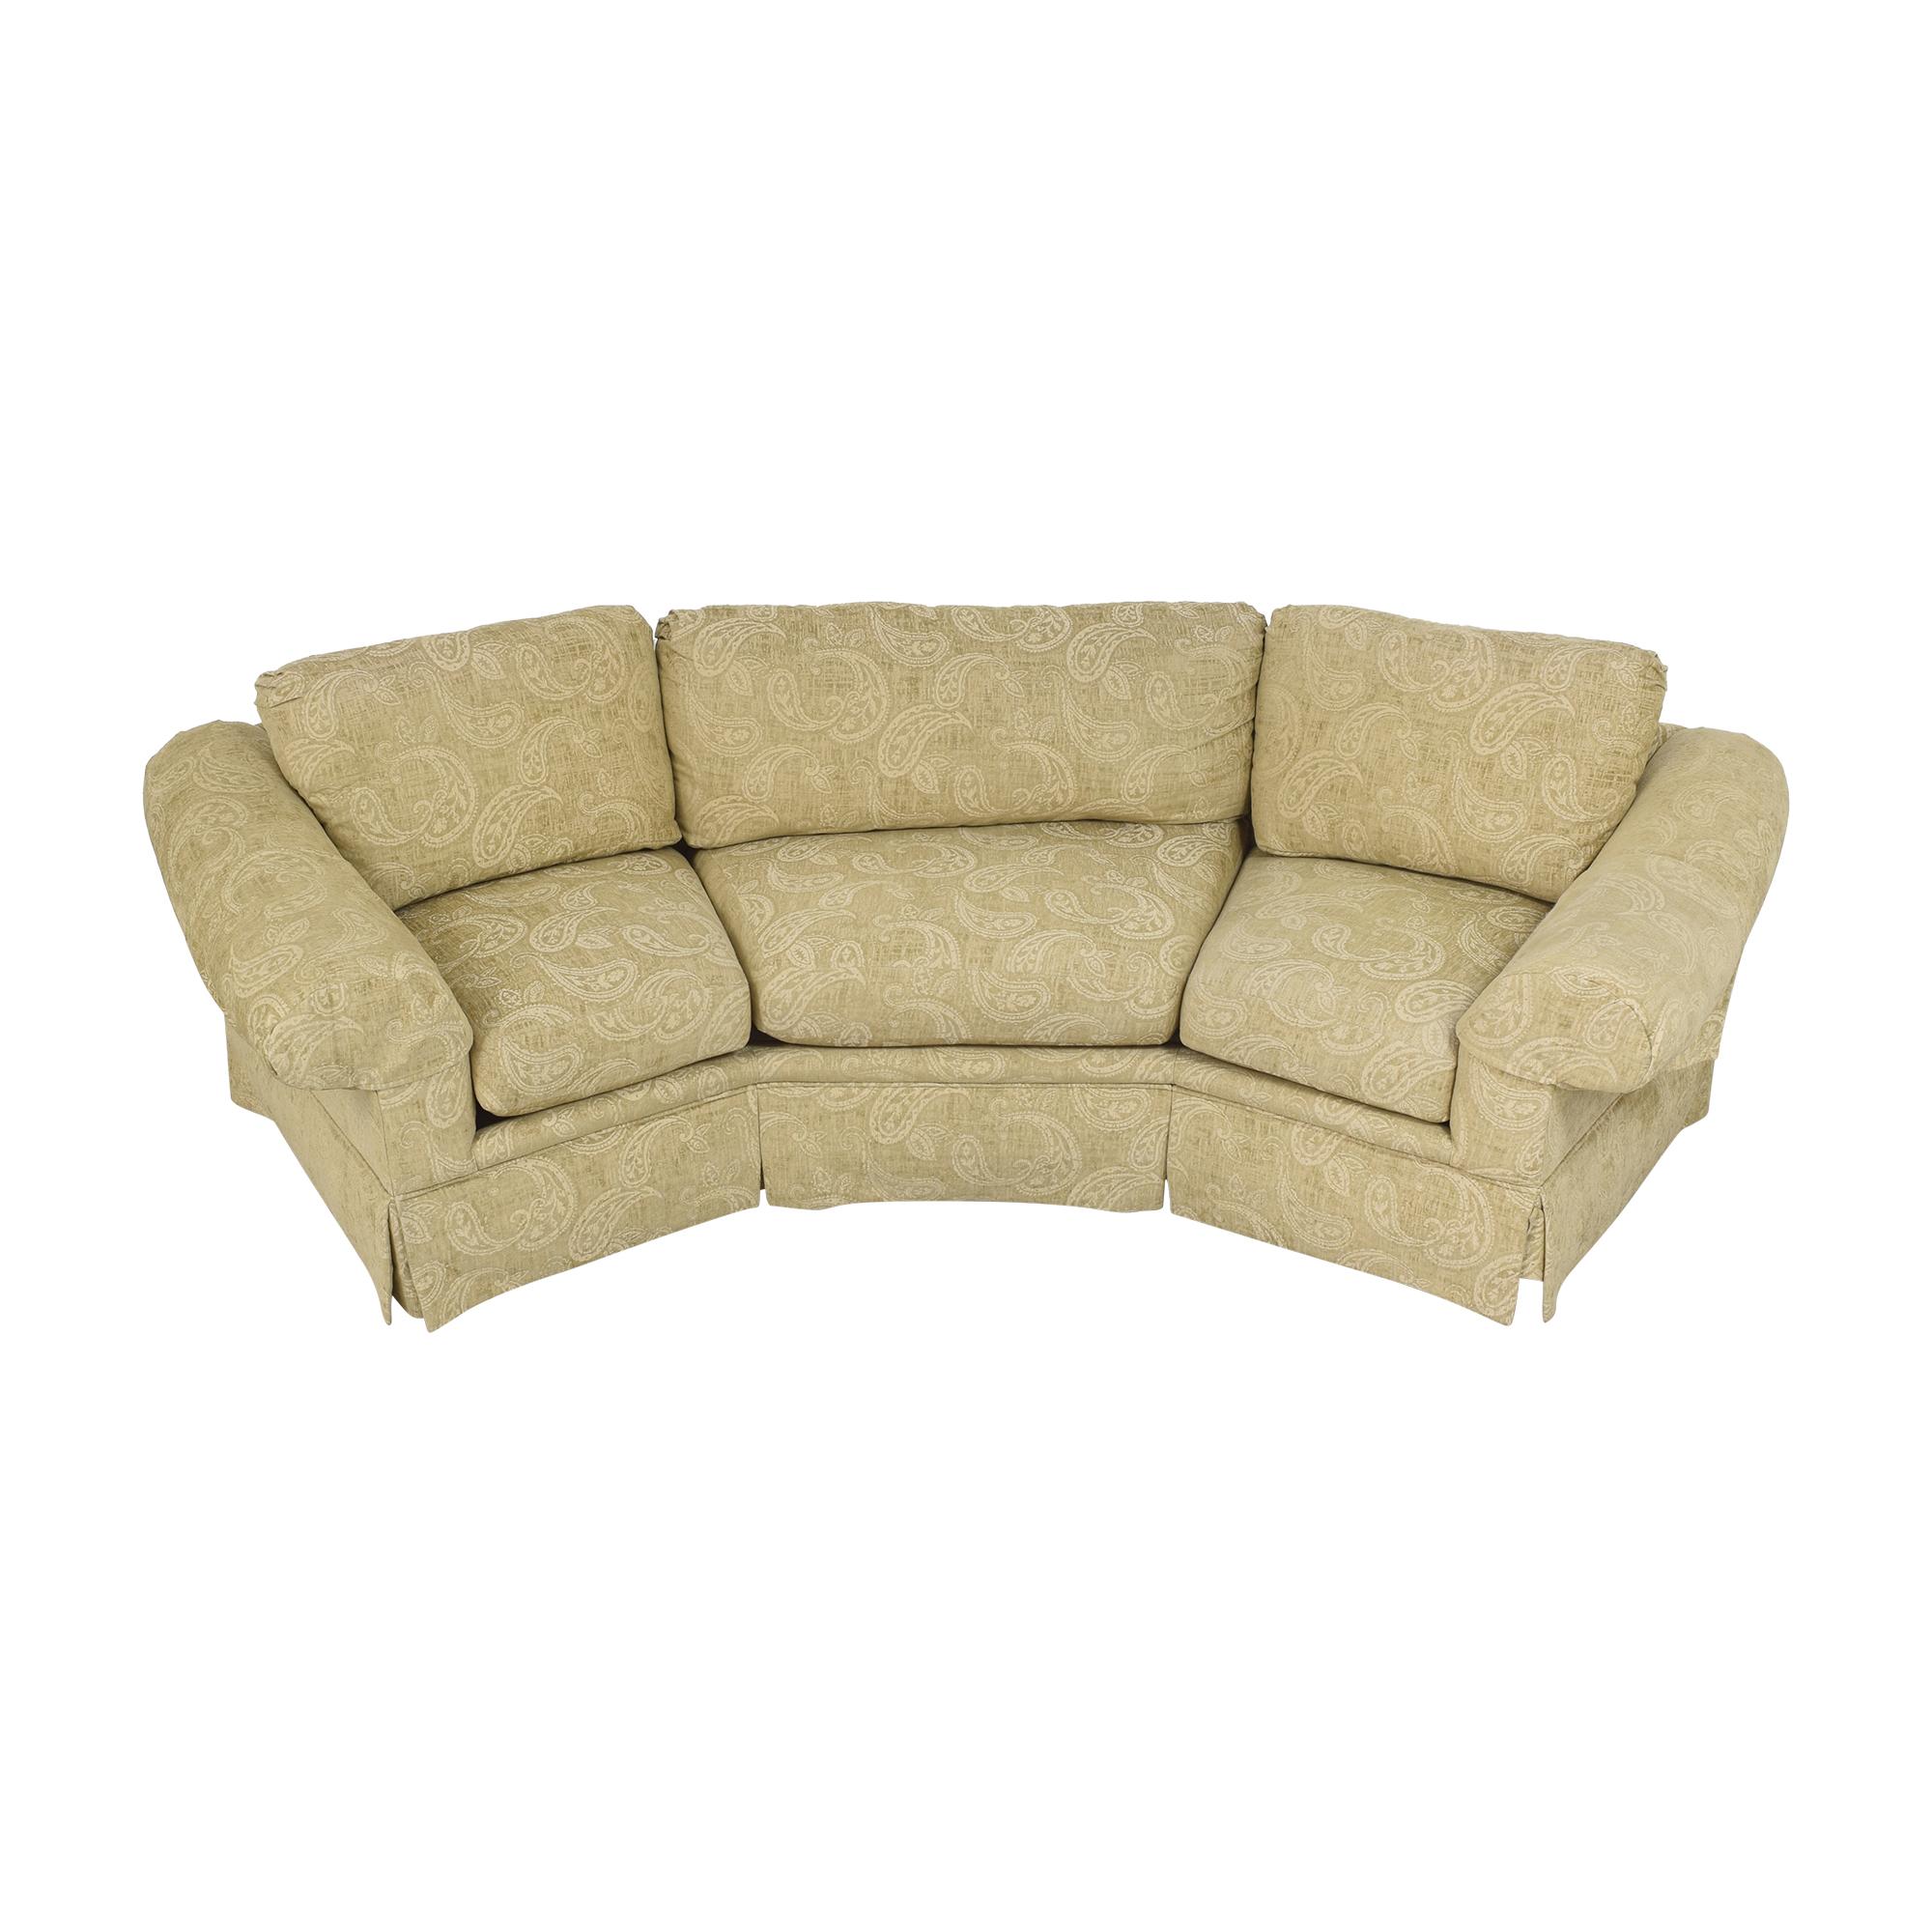 Thomasville Wedge Sofa / Classic Sofas